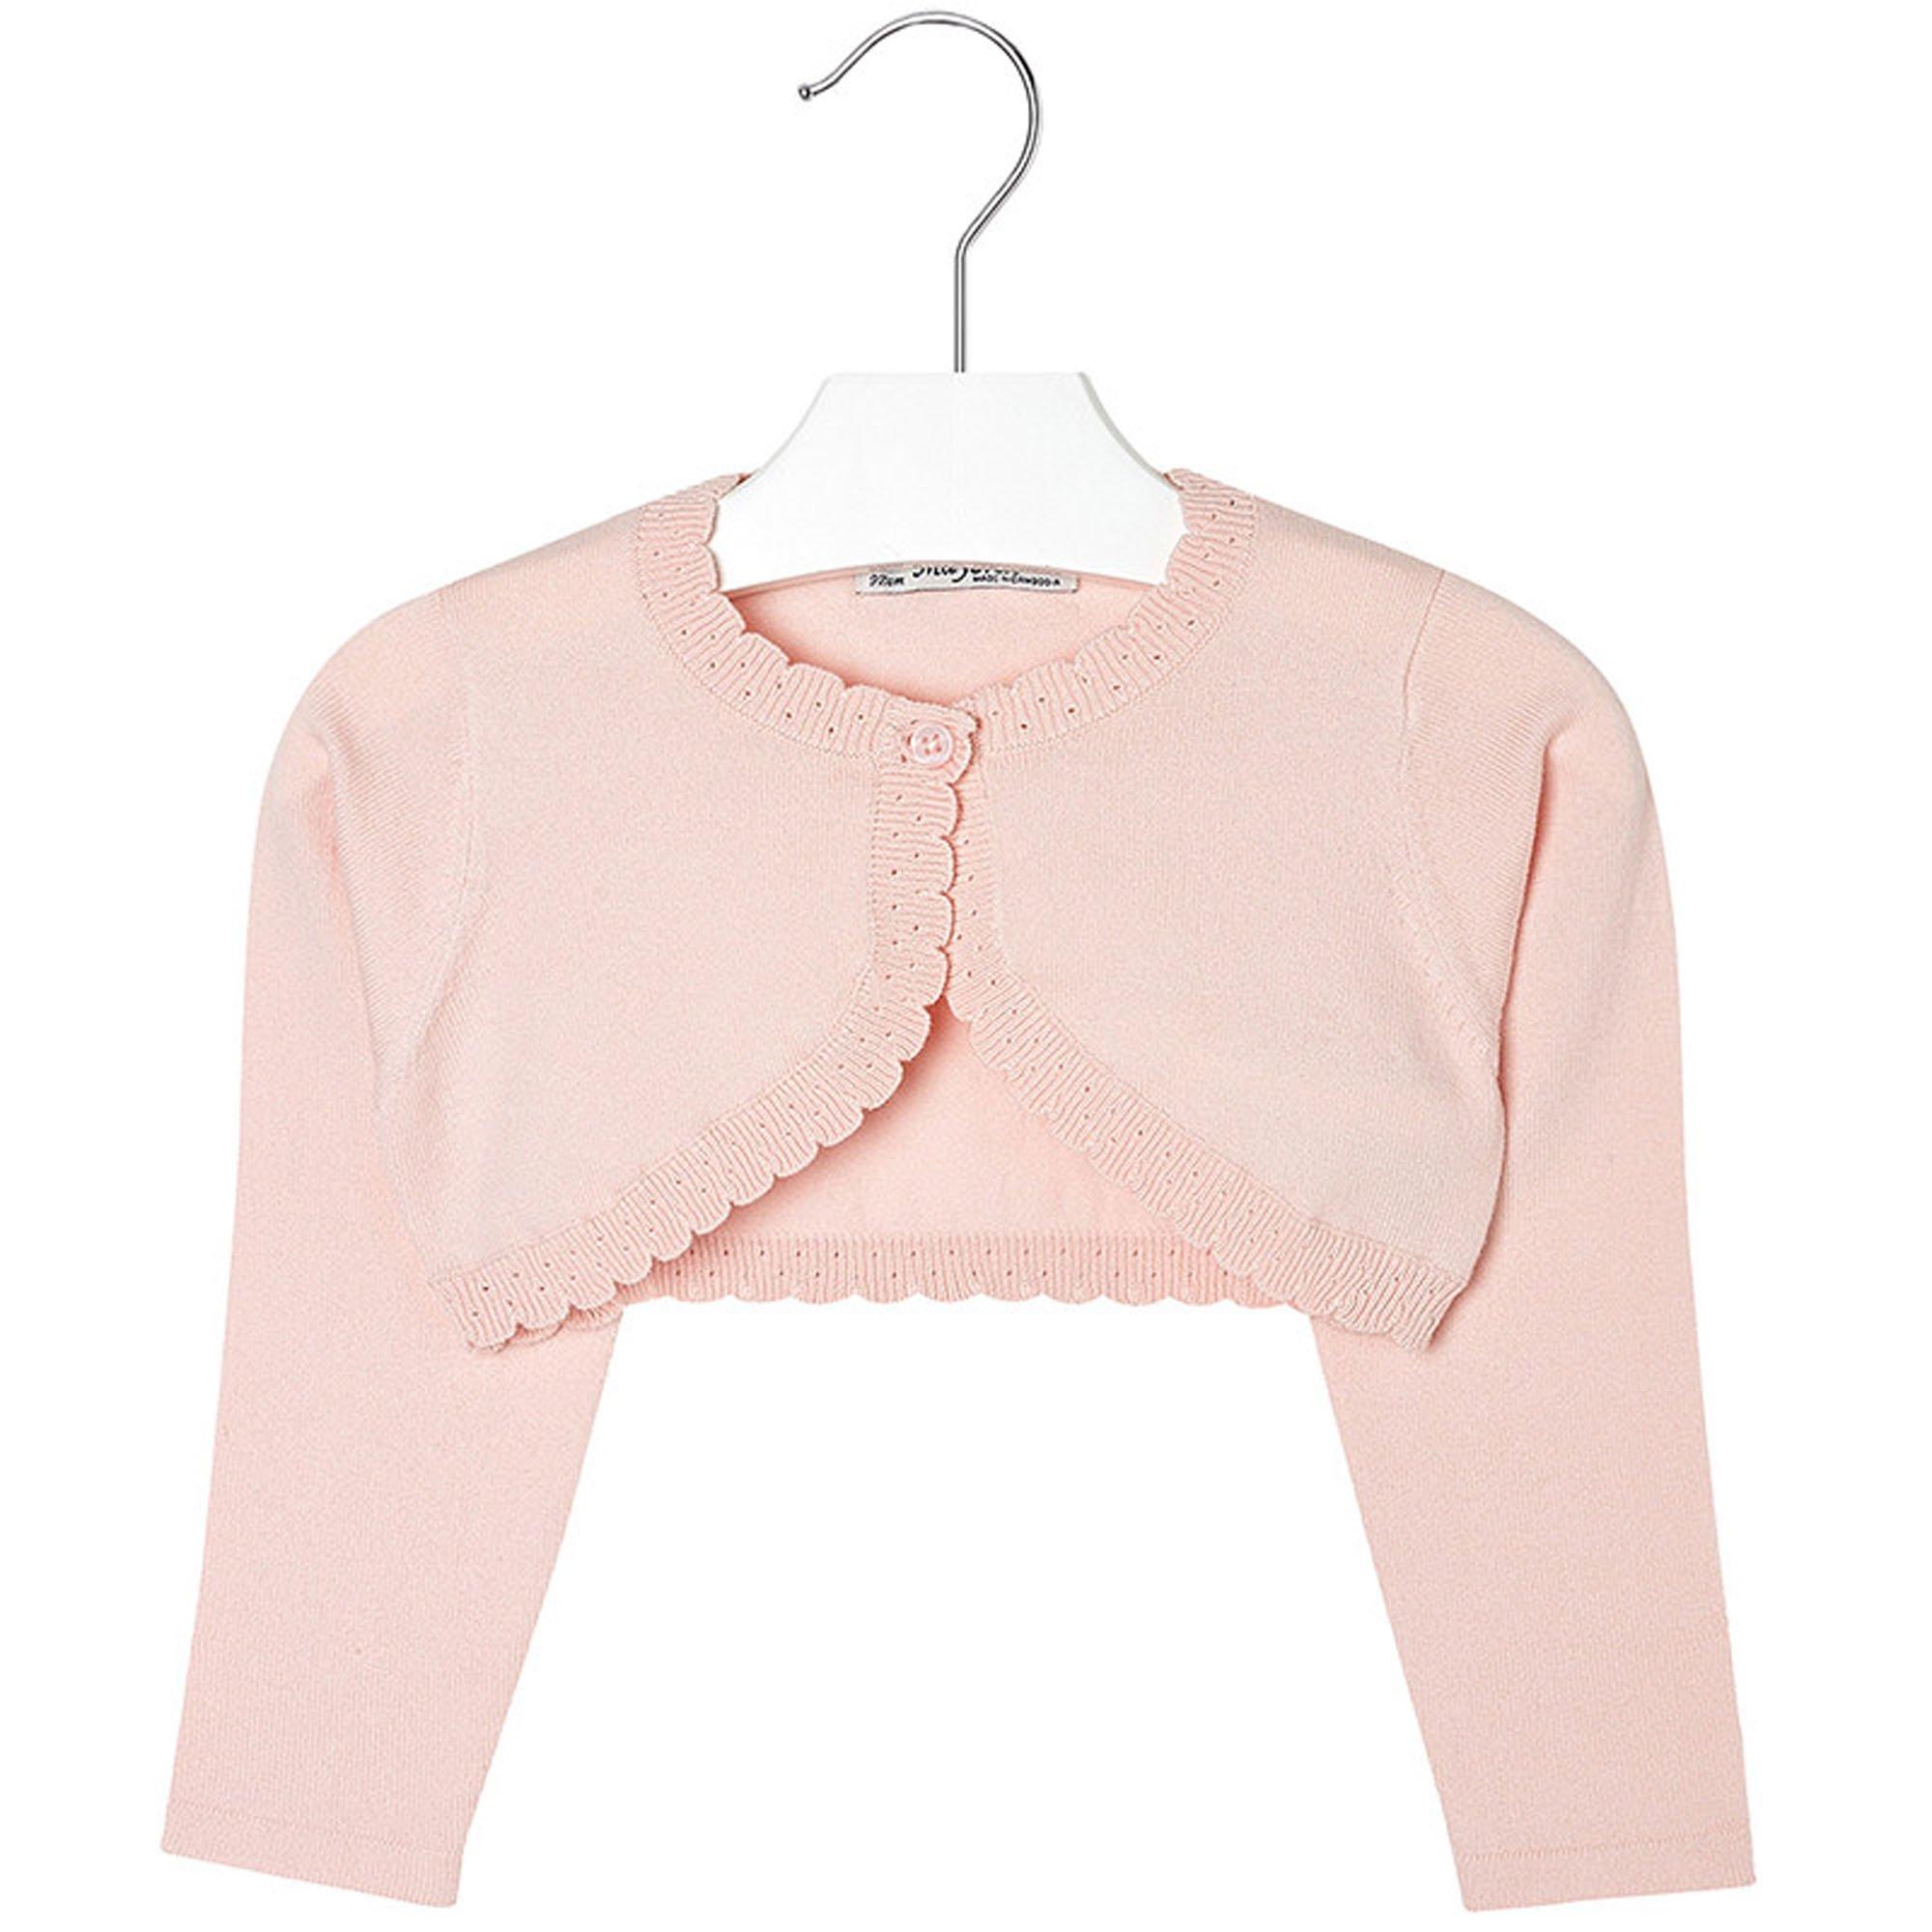 Mayoral Girls 2T-9 Light Rose-Pink Scallop Edge Knit Shrug Cardigan Sweater, Rose Paste,9